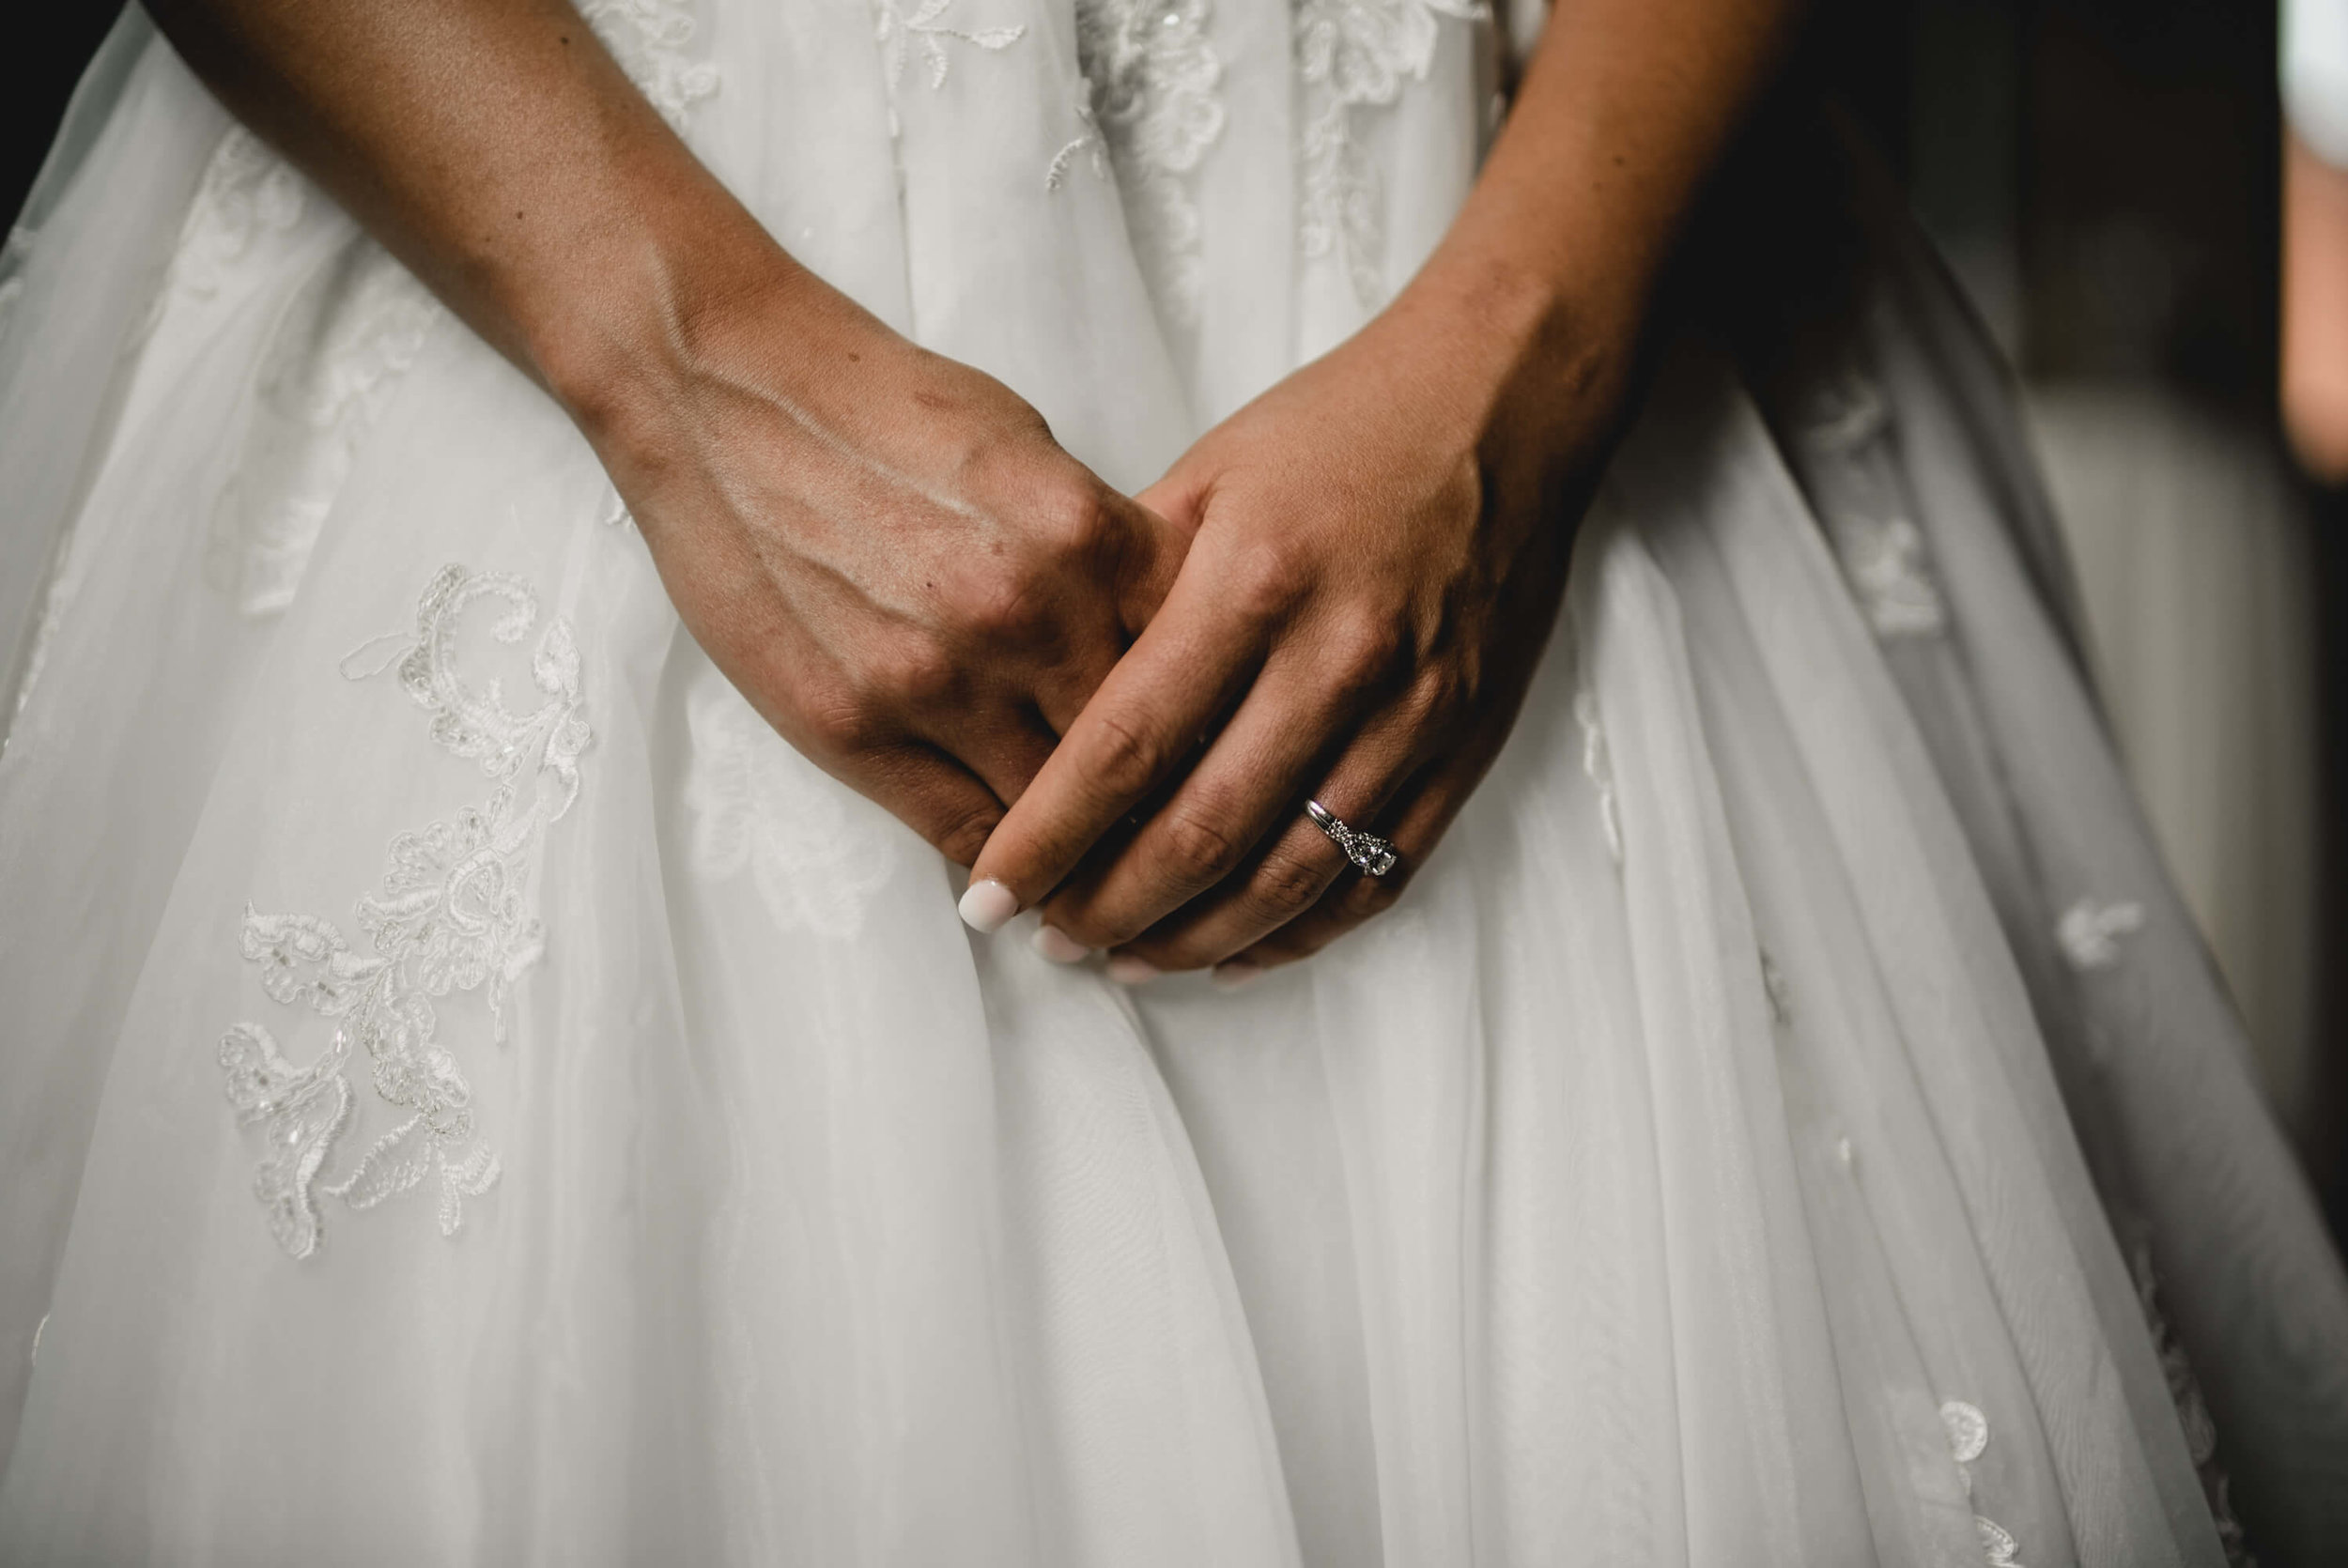 engle-olson-jen-chad-minnesota-wedding- (237 of 1332).jpg